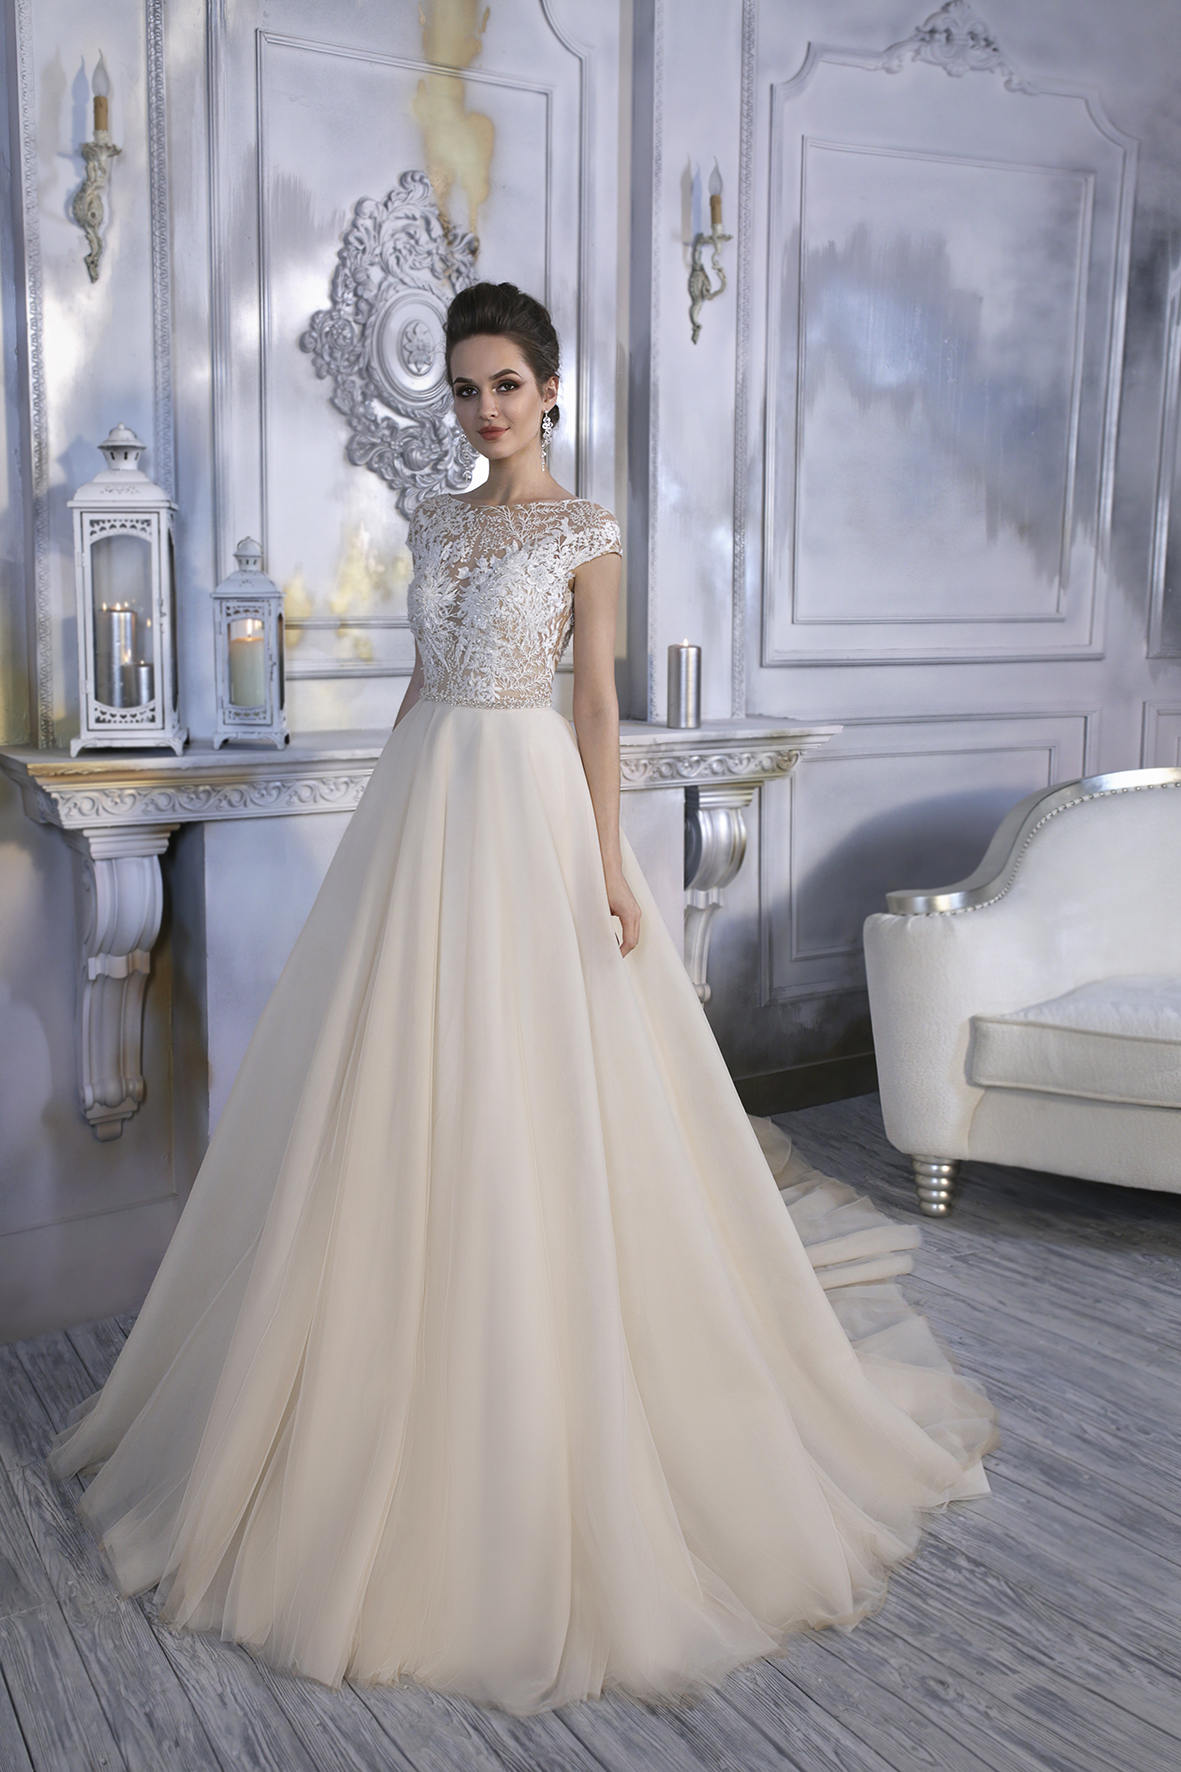 Open Back Wedding Dress - Orla Unique Wedding Dress - Long Wedding Dress with Train - Simple Lace Dress - Abito da Sposa - Robe de Mariée.jpg